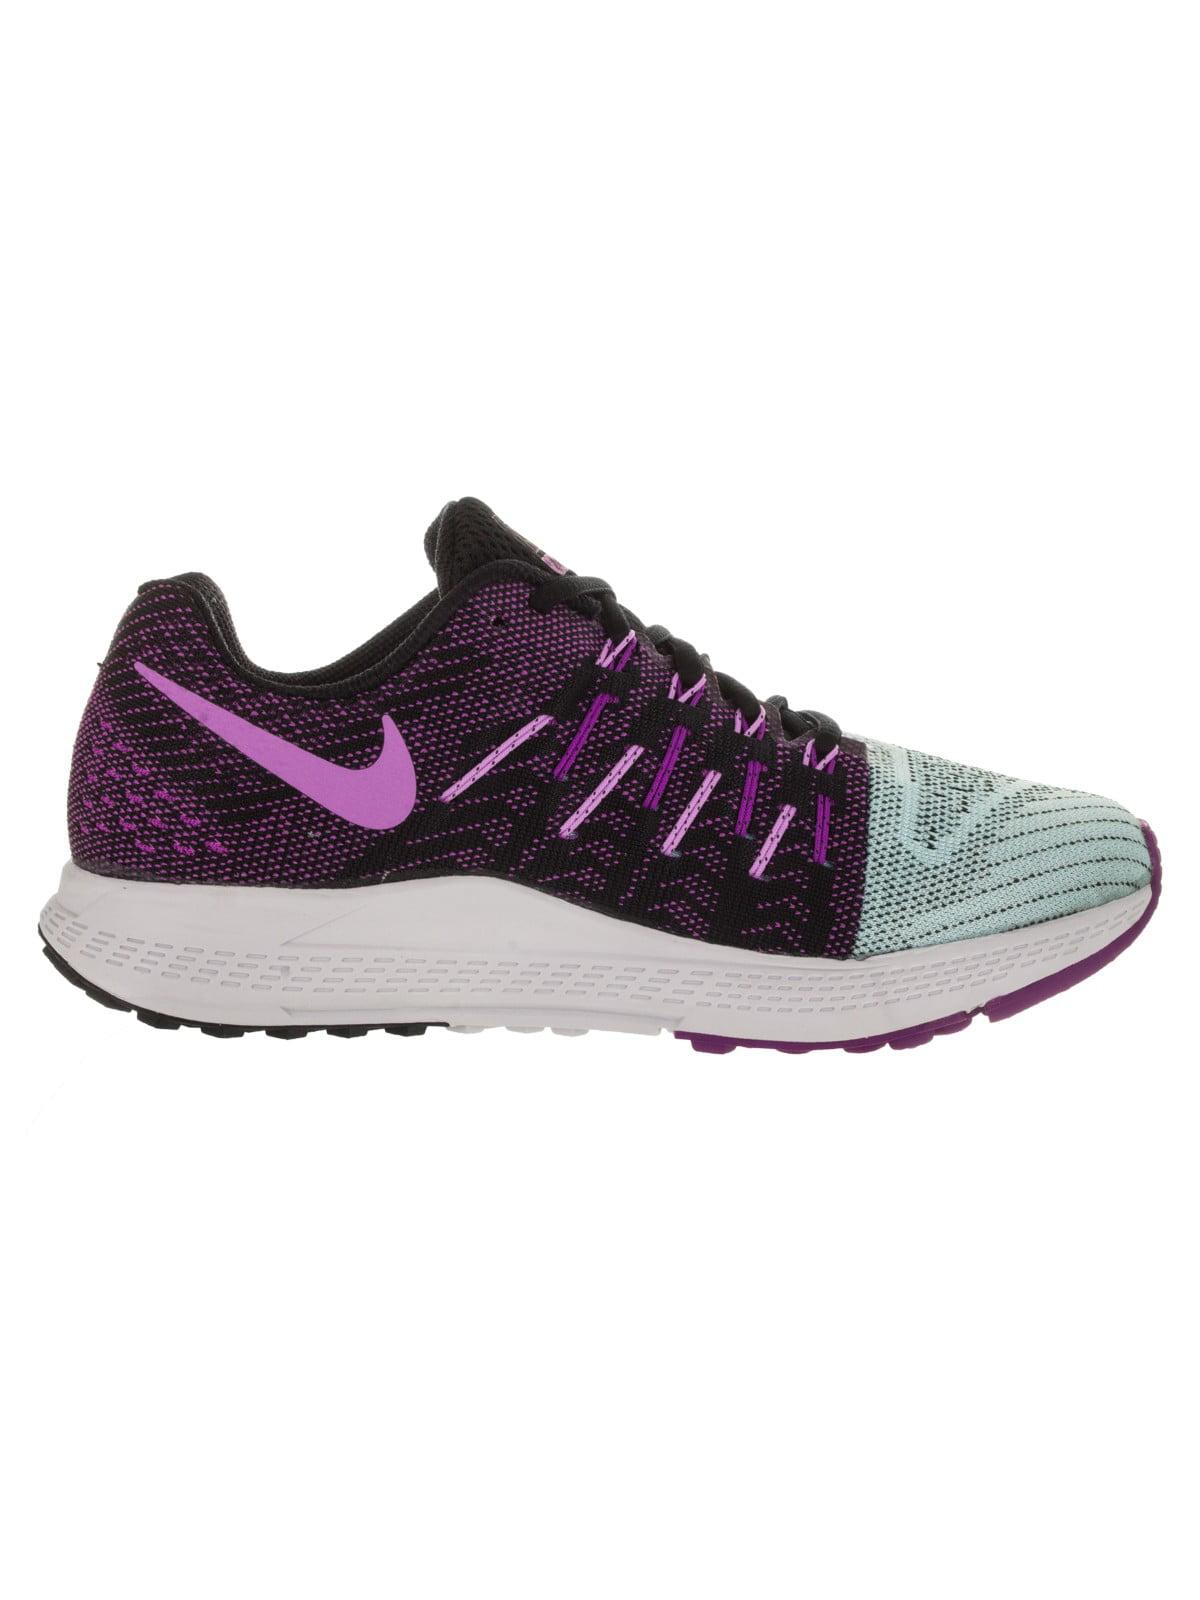 Nike Women's Shoe:Men's/Women's: Air Zoom Elite 8 Running Shoe:Men's/Women's: Women's Good global reputation 116452